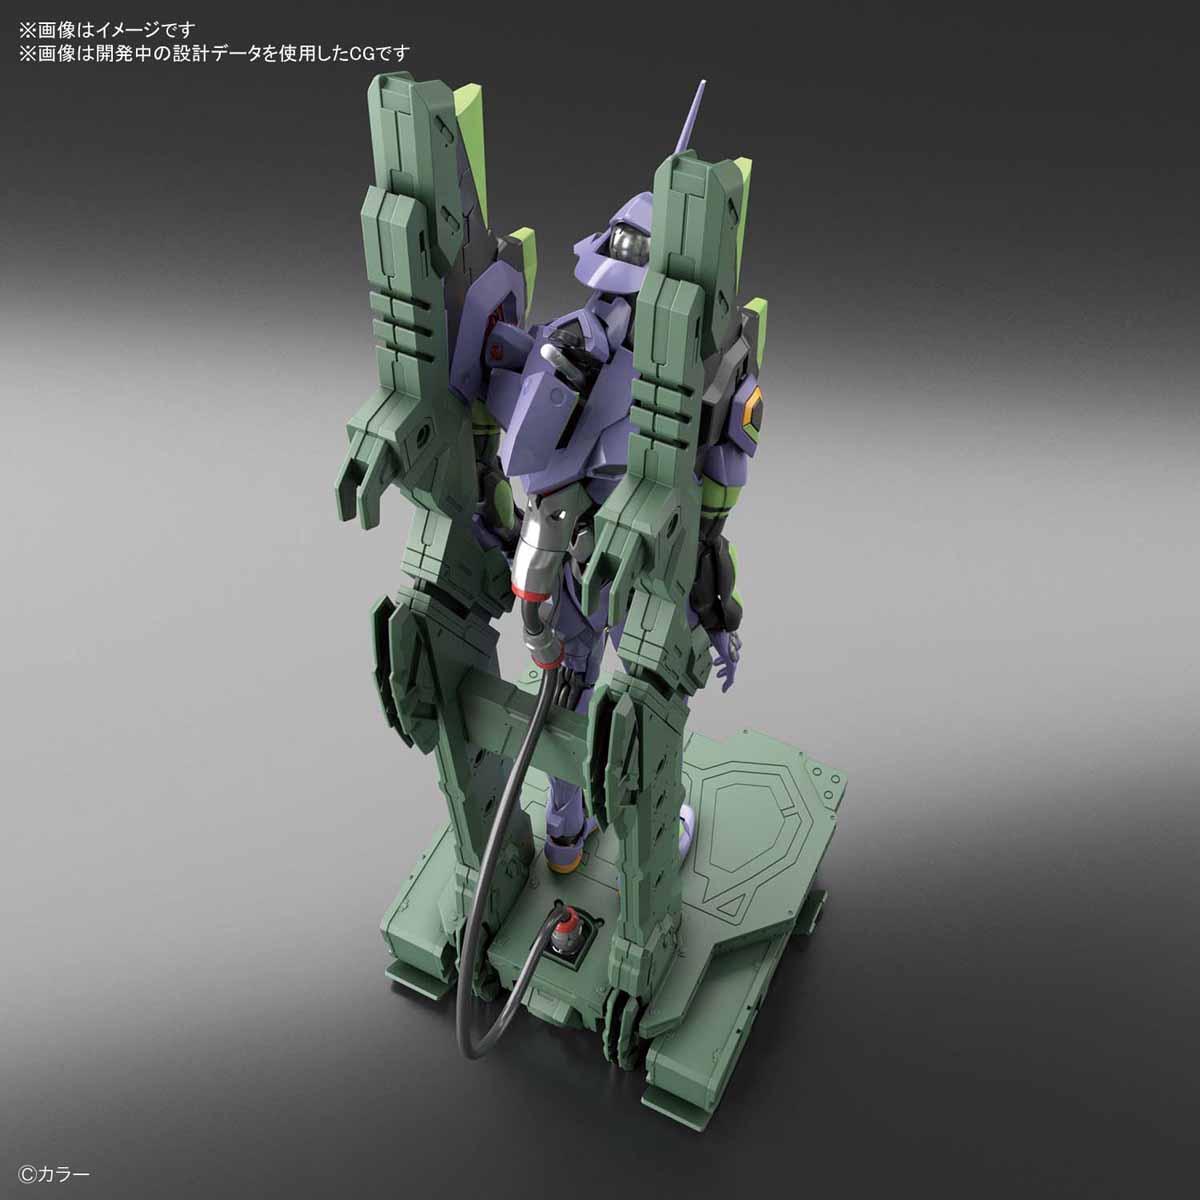 RG『汎用ヒト型決戦兵器 人造人間エヴァンゲリオン初号機』プラモデル-013